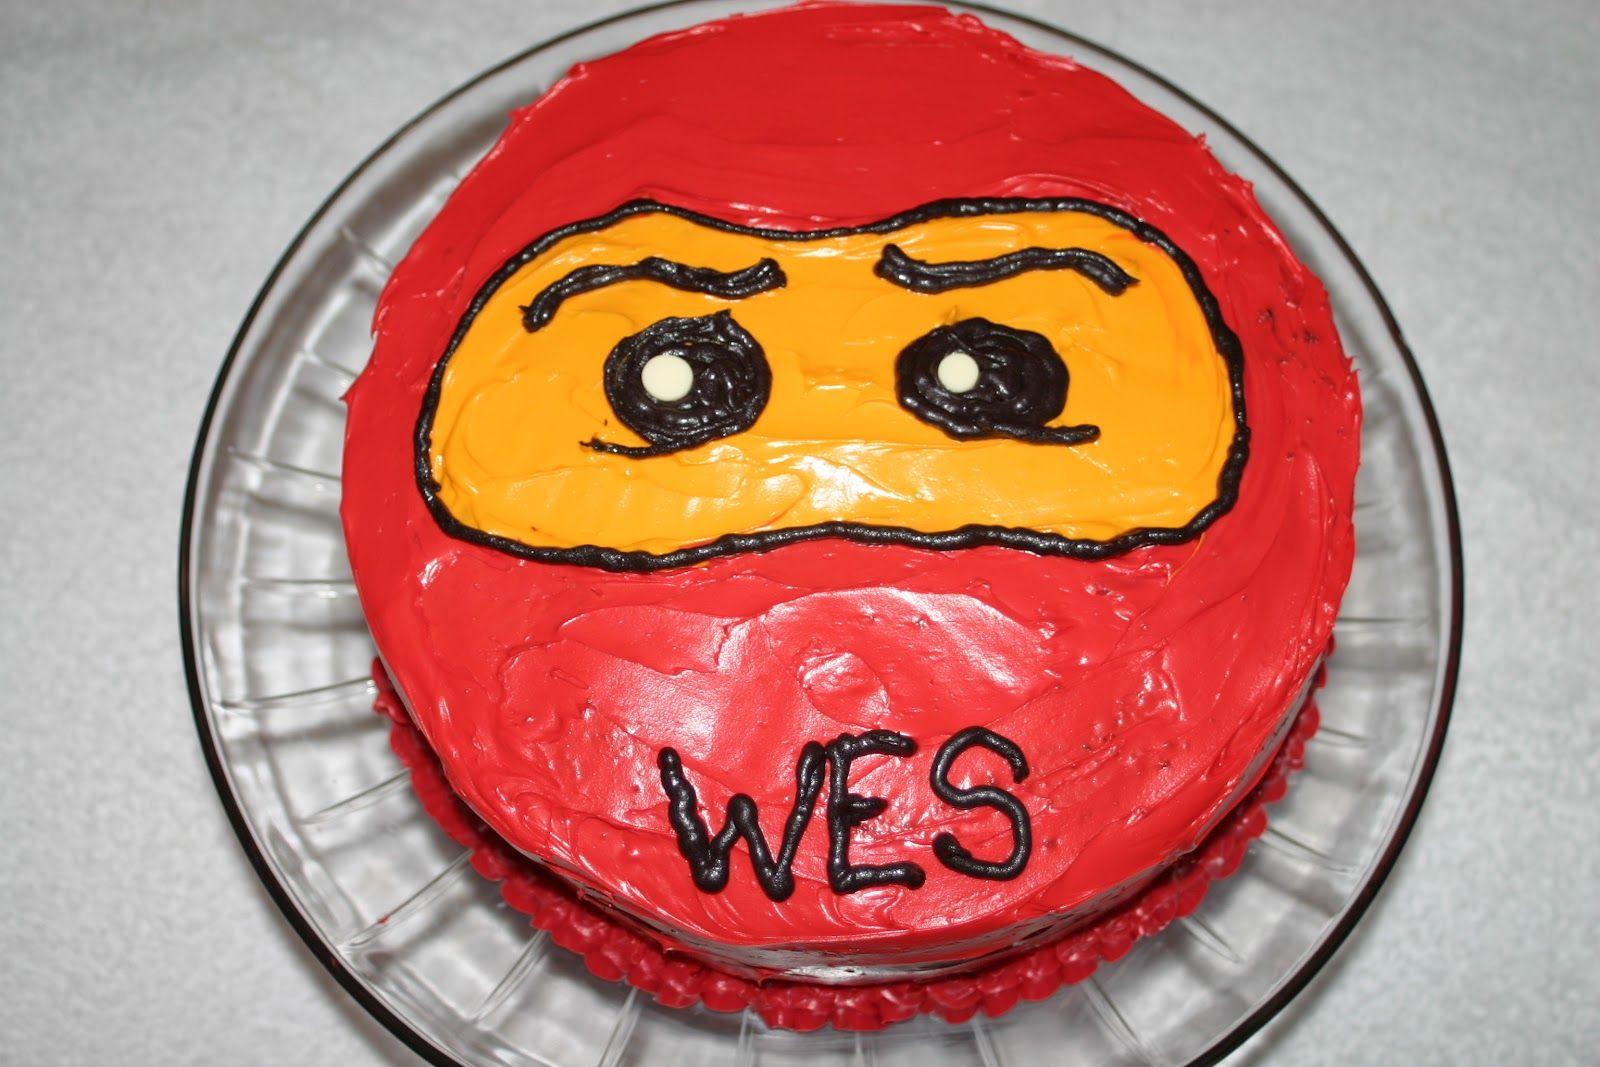 ninjago birthday cake ideas | found this adorable idea on